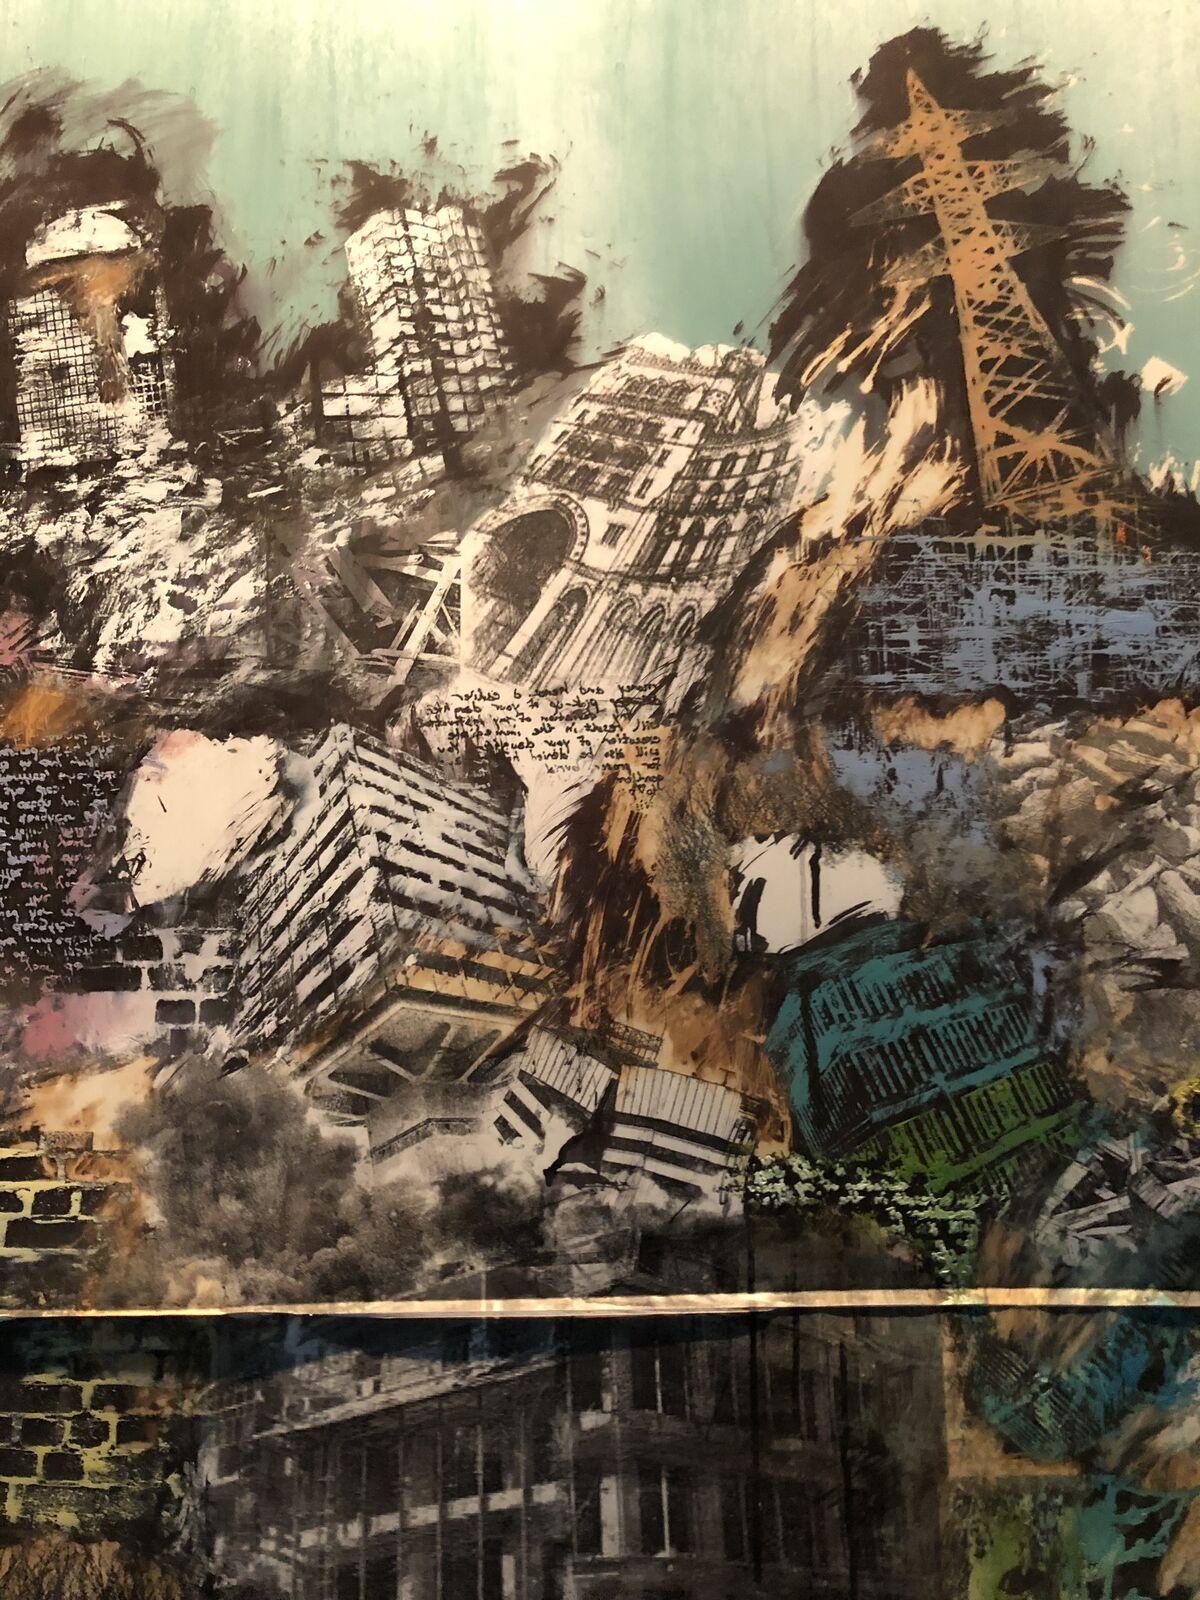 Detail of Paul Onditi, Grey tones, 2018. Photo © Oumy Diaw.